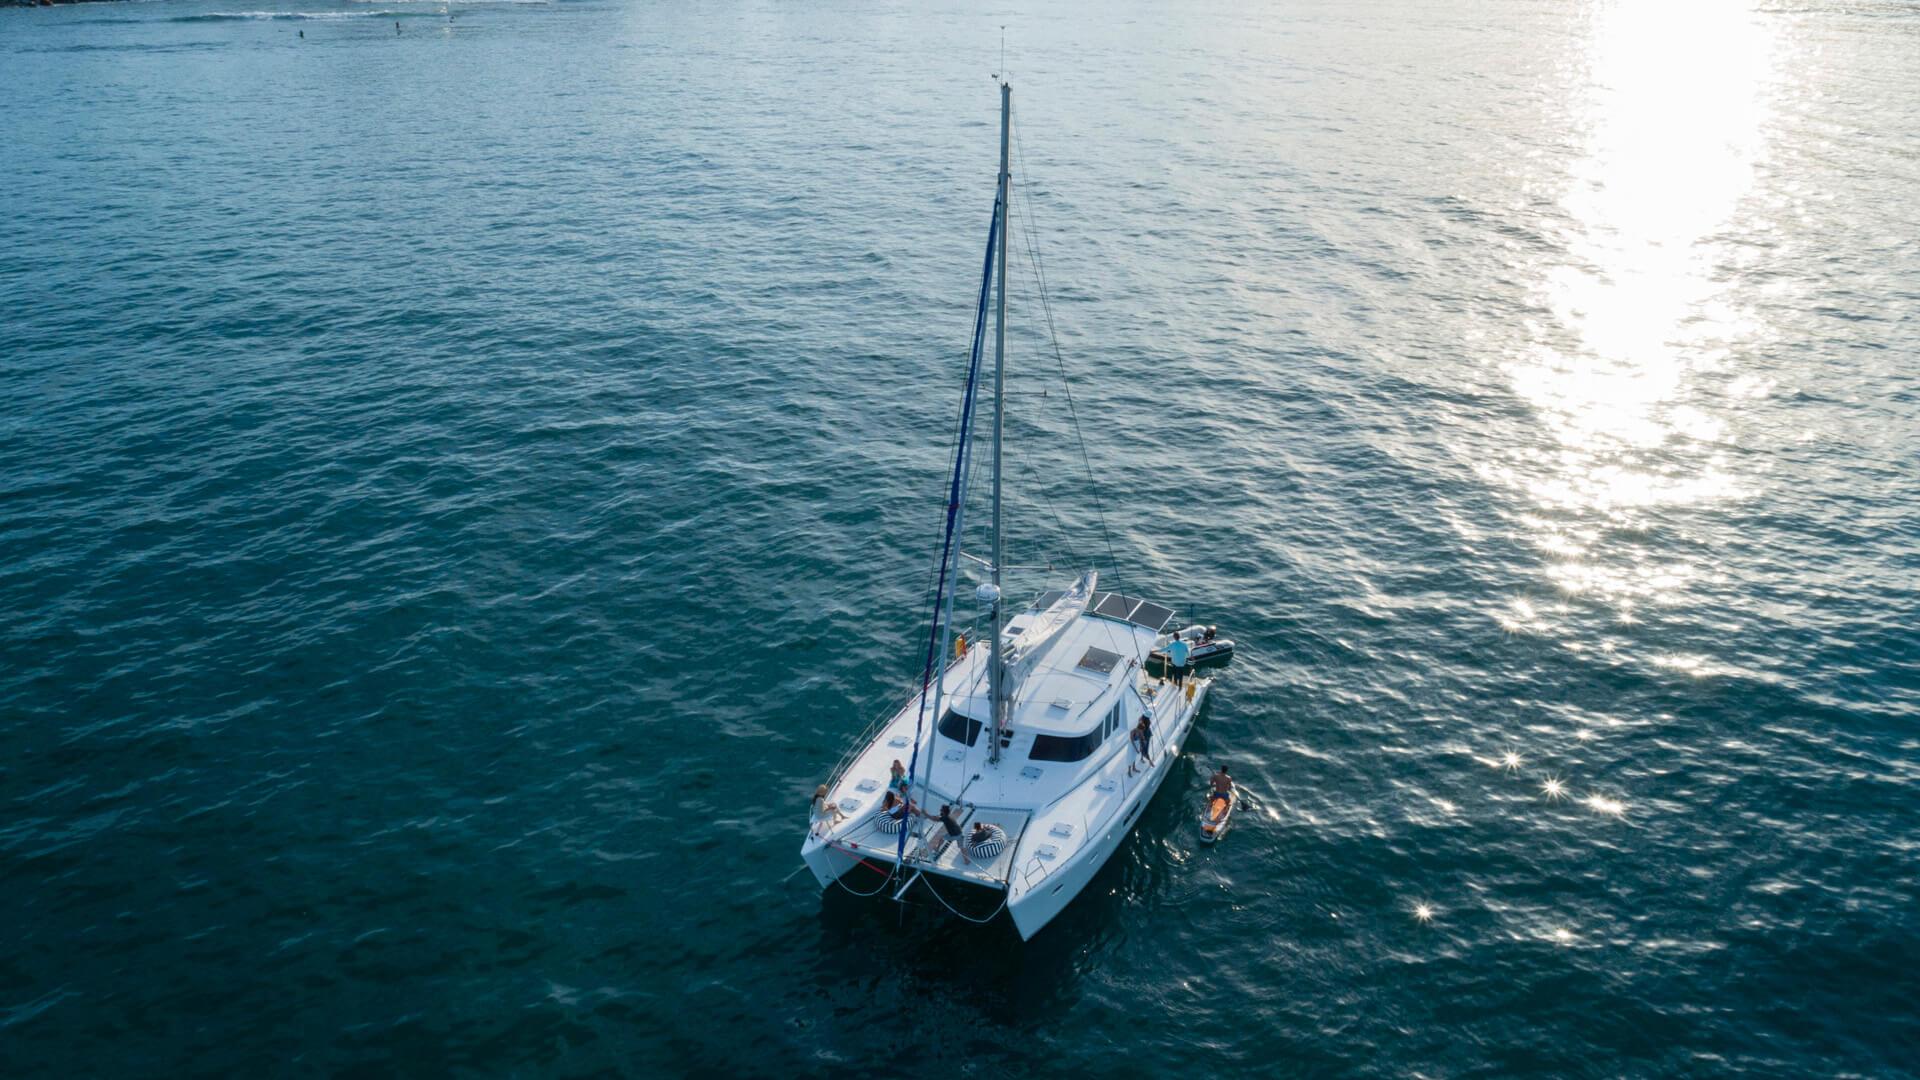 47th Catamaran out on the ocean